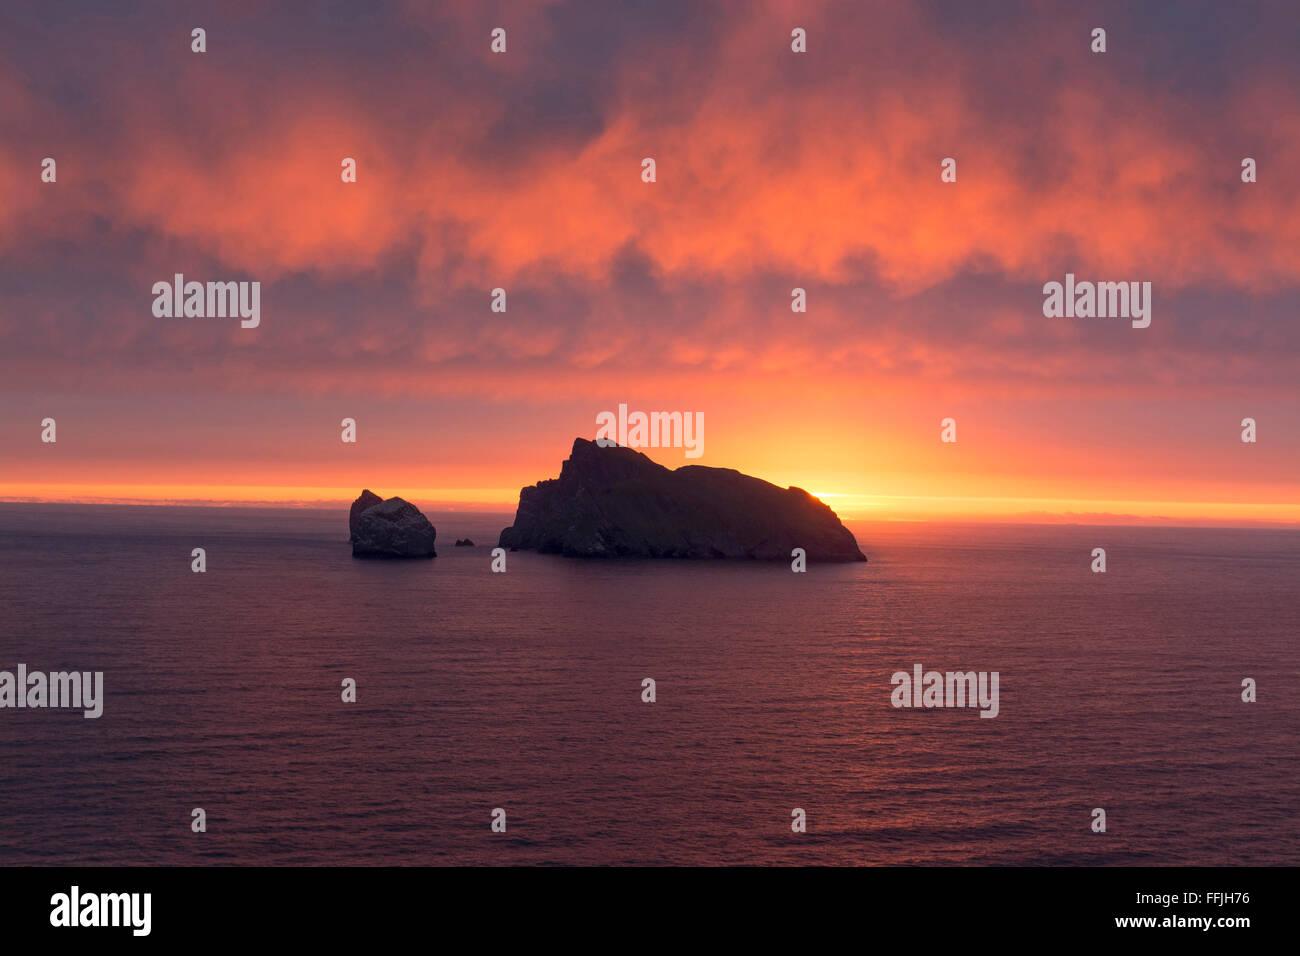 st kilda archipelago atlantic boreray sunrise - Stock Image